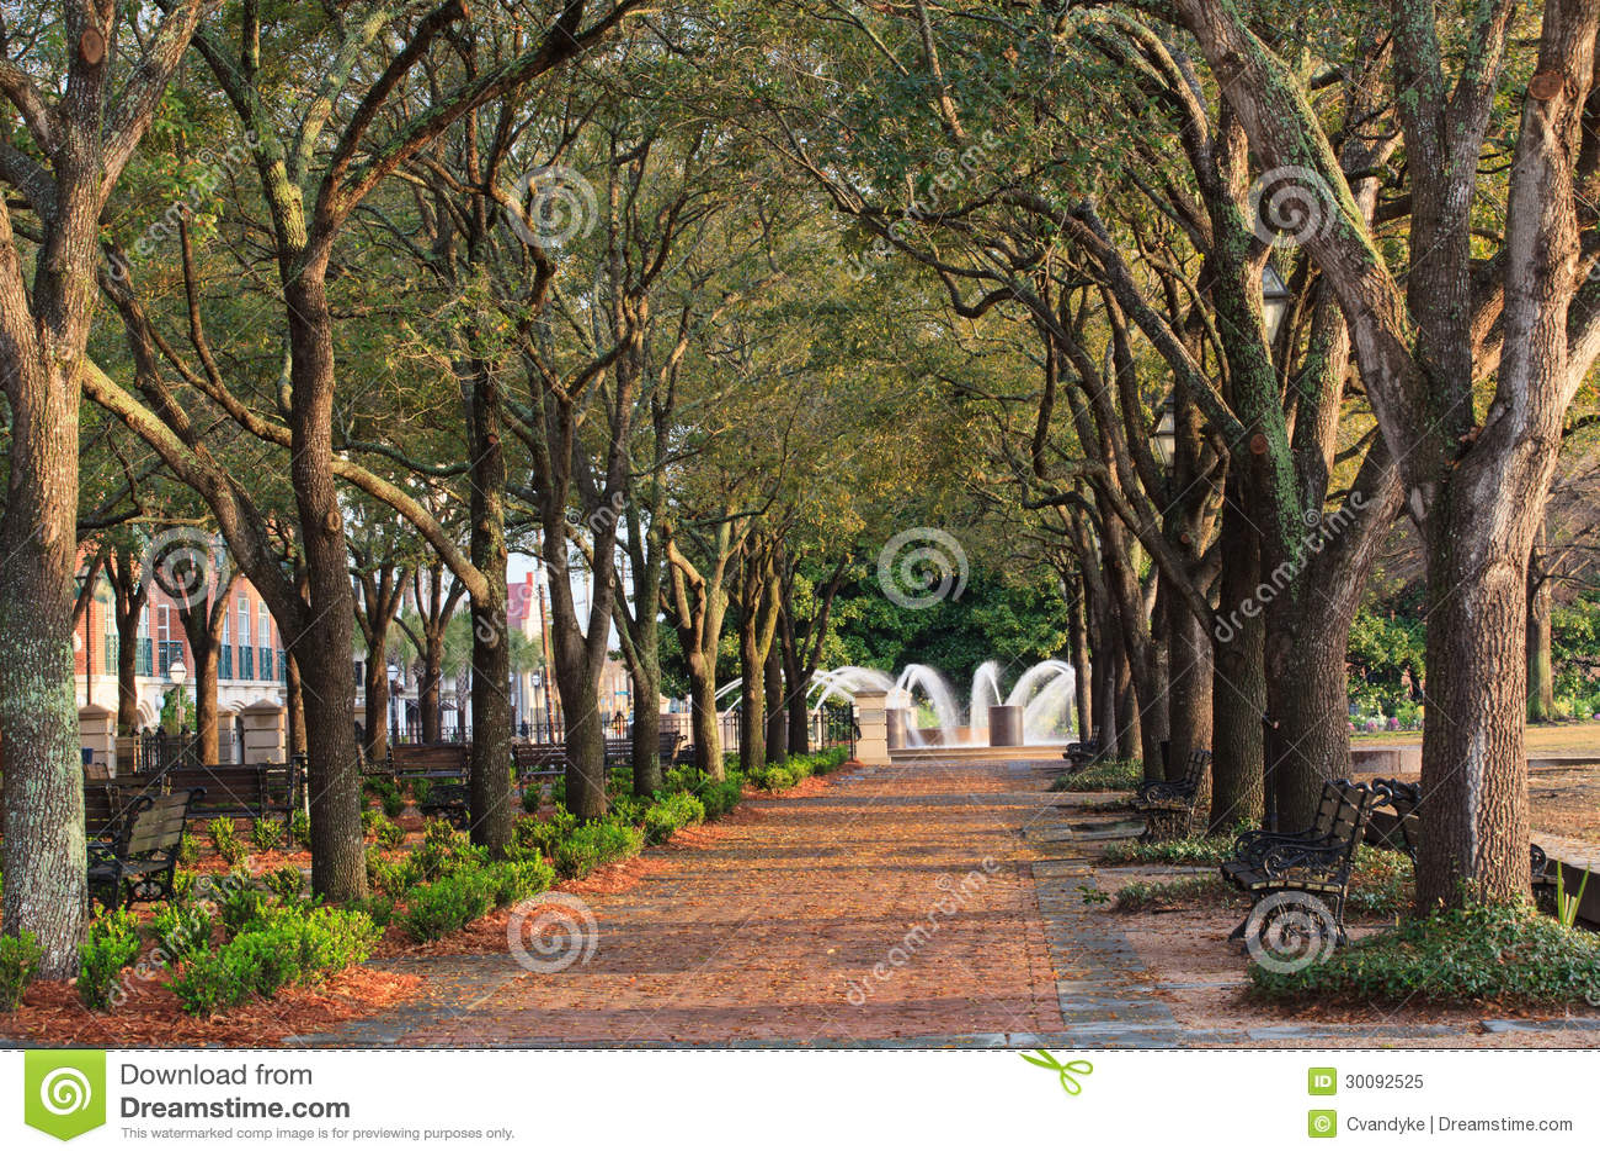 Pedestrian Walkway Tree Canopy Charleston Sc Stock Image